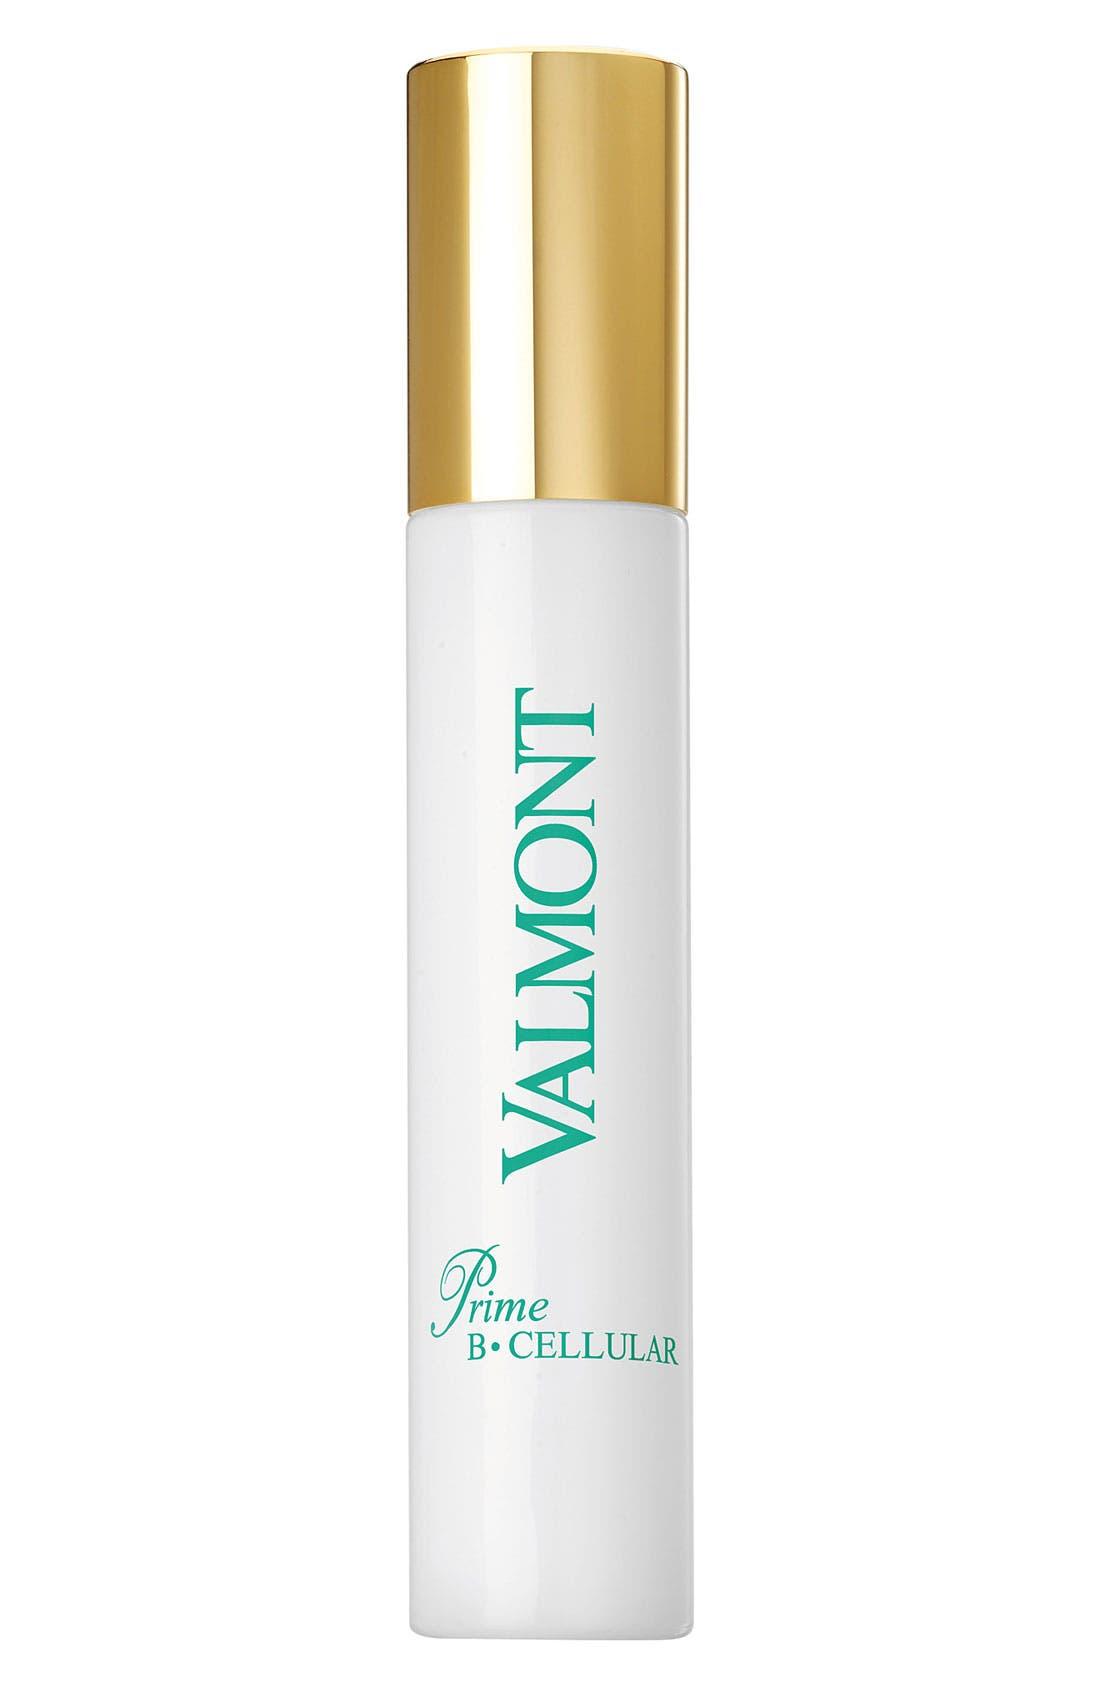 Valmont 'Prime B-Cellular' Anti-Aging Serum